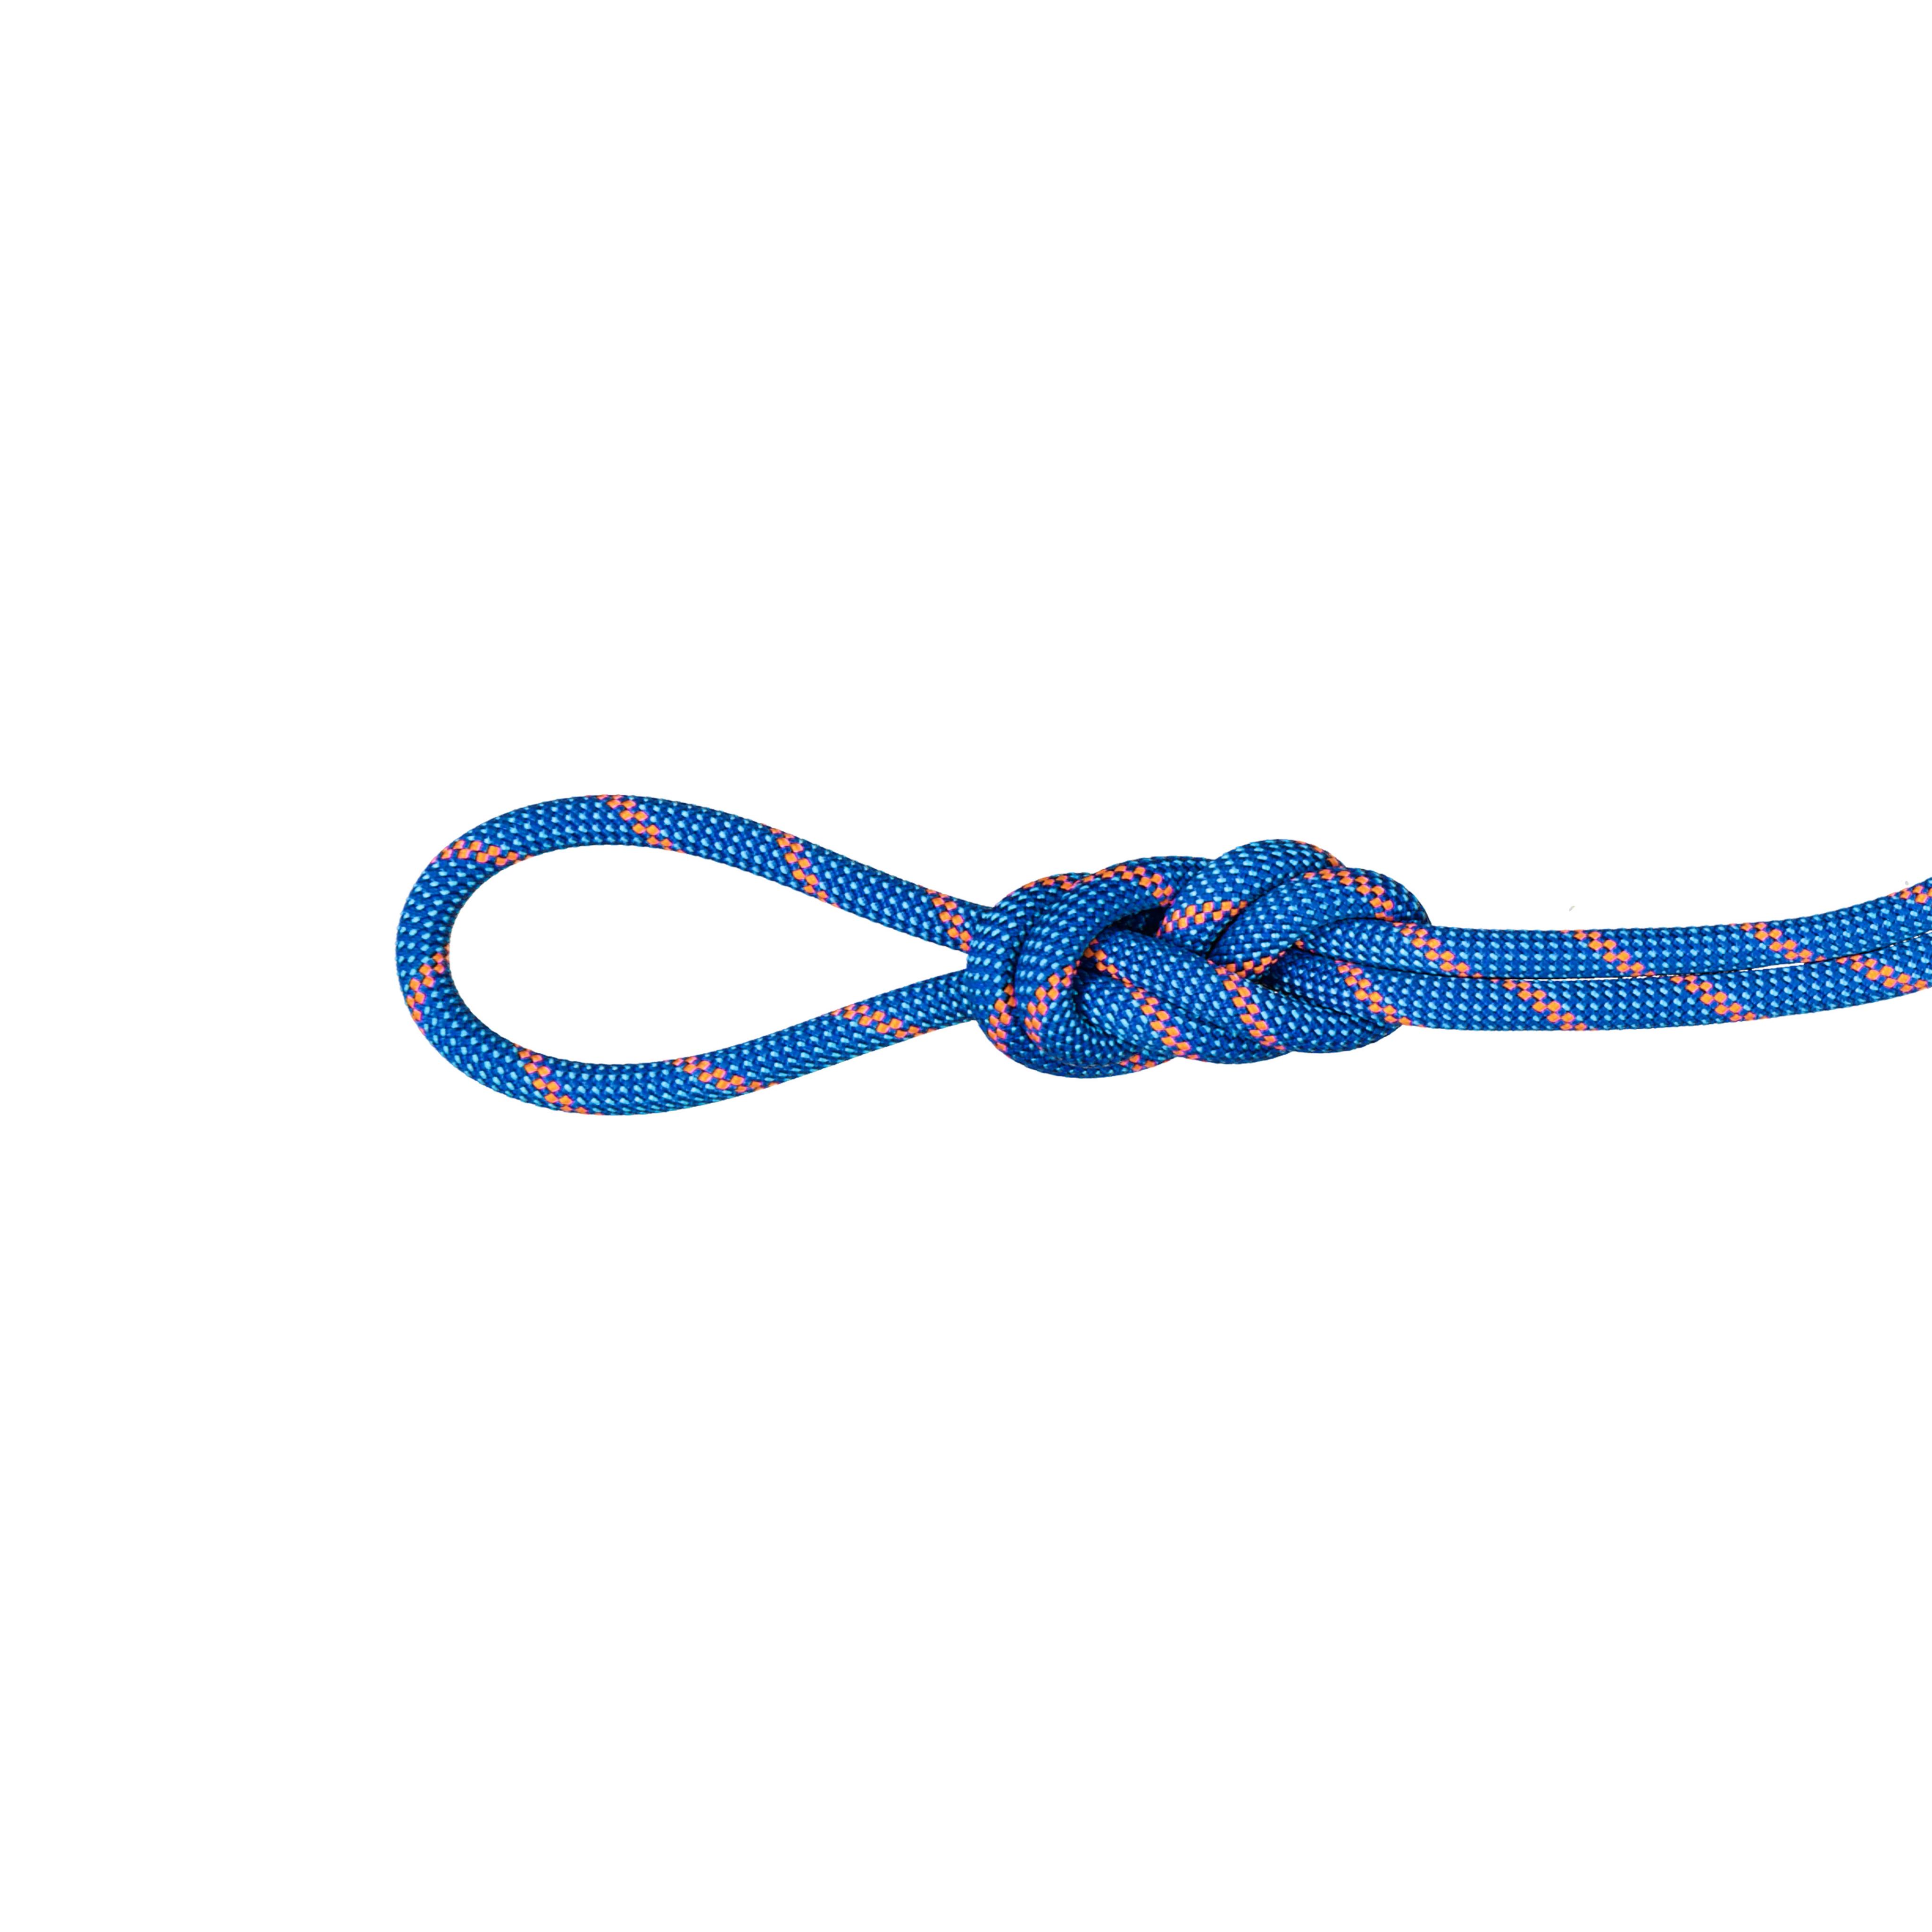 7.5 Alpine Sender Dry Rope - 50 m, Dry Standard, blue-safety orange thumbnail